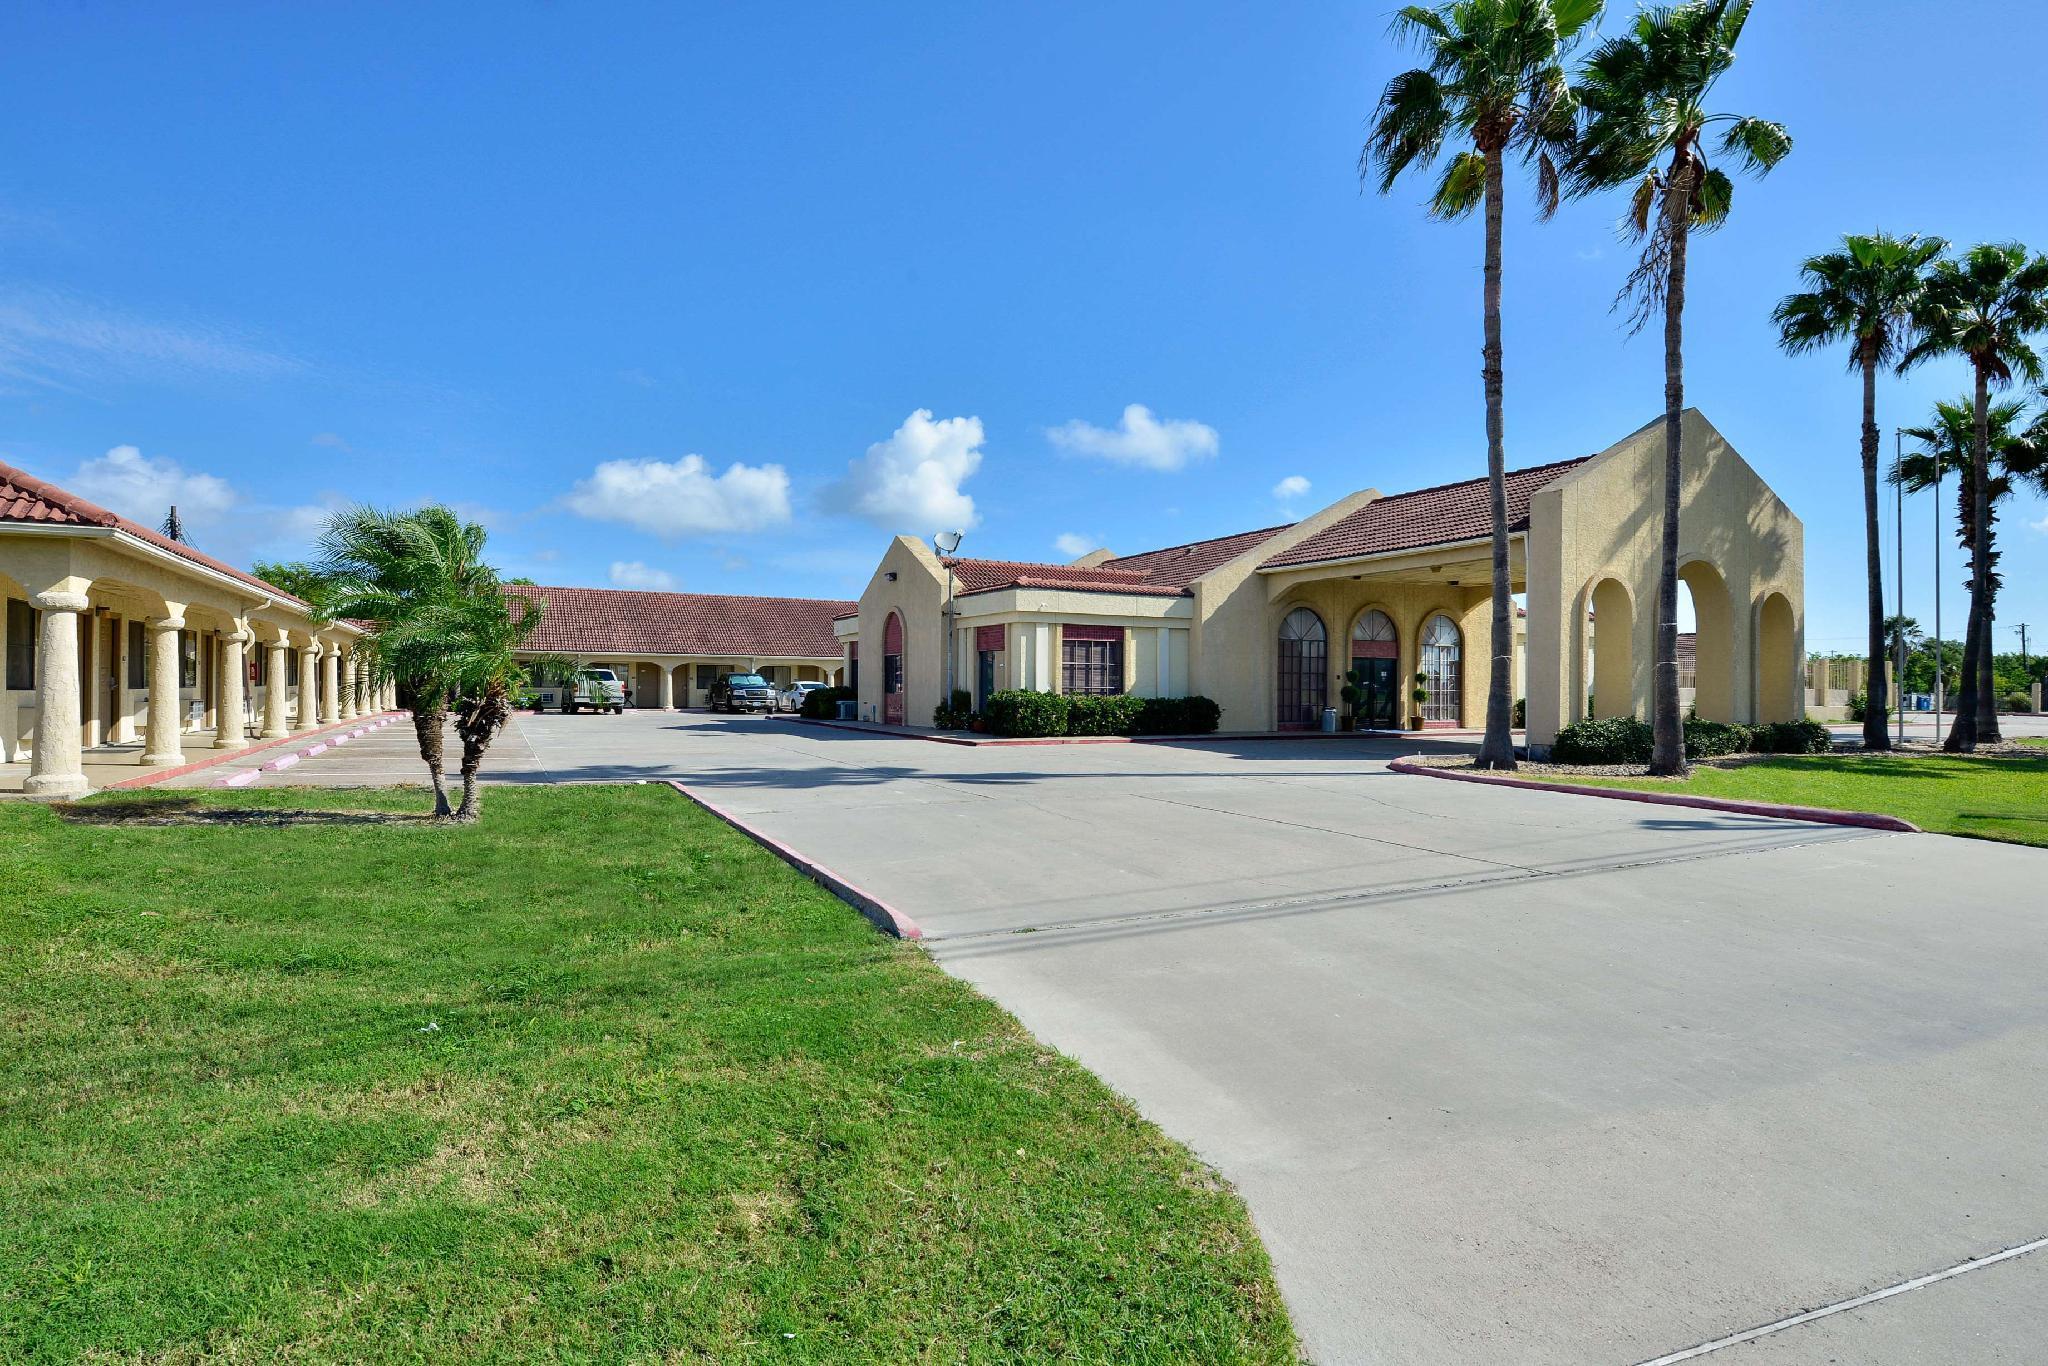 Americas Best Value Inn And Suites Aransas Pass